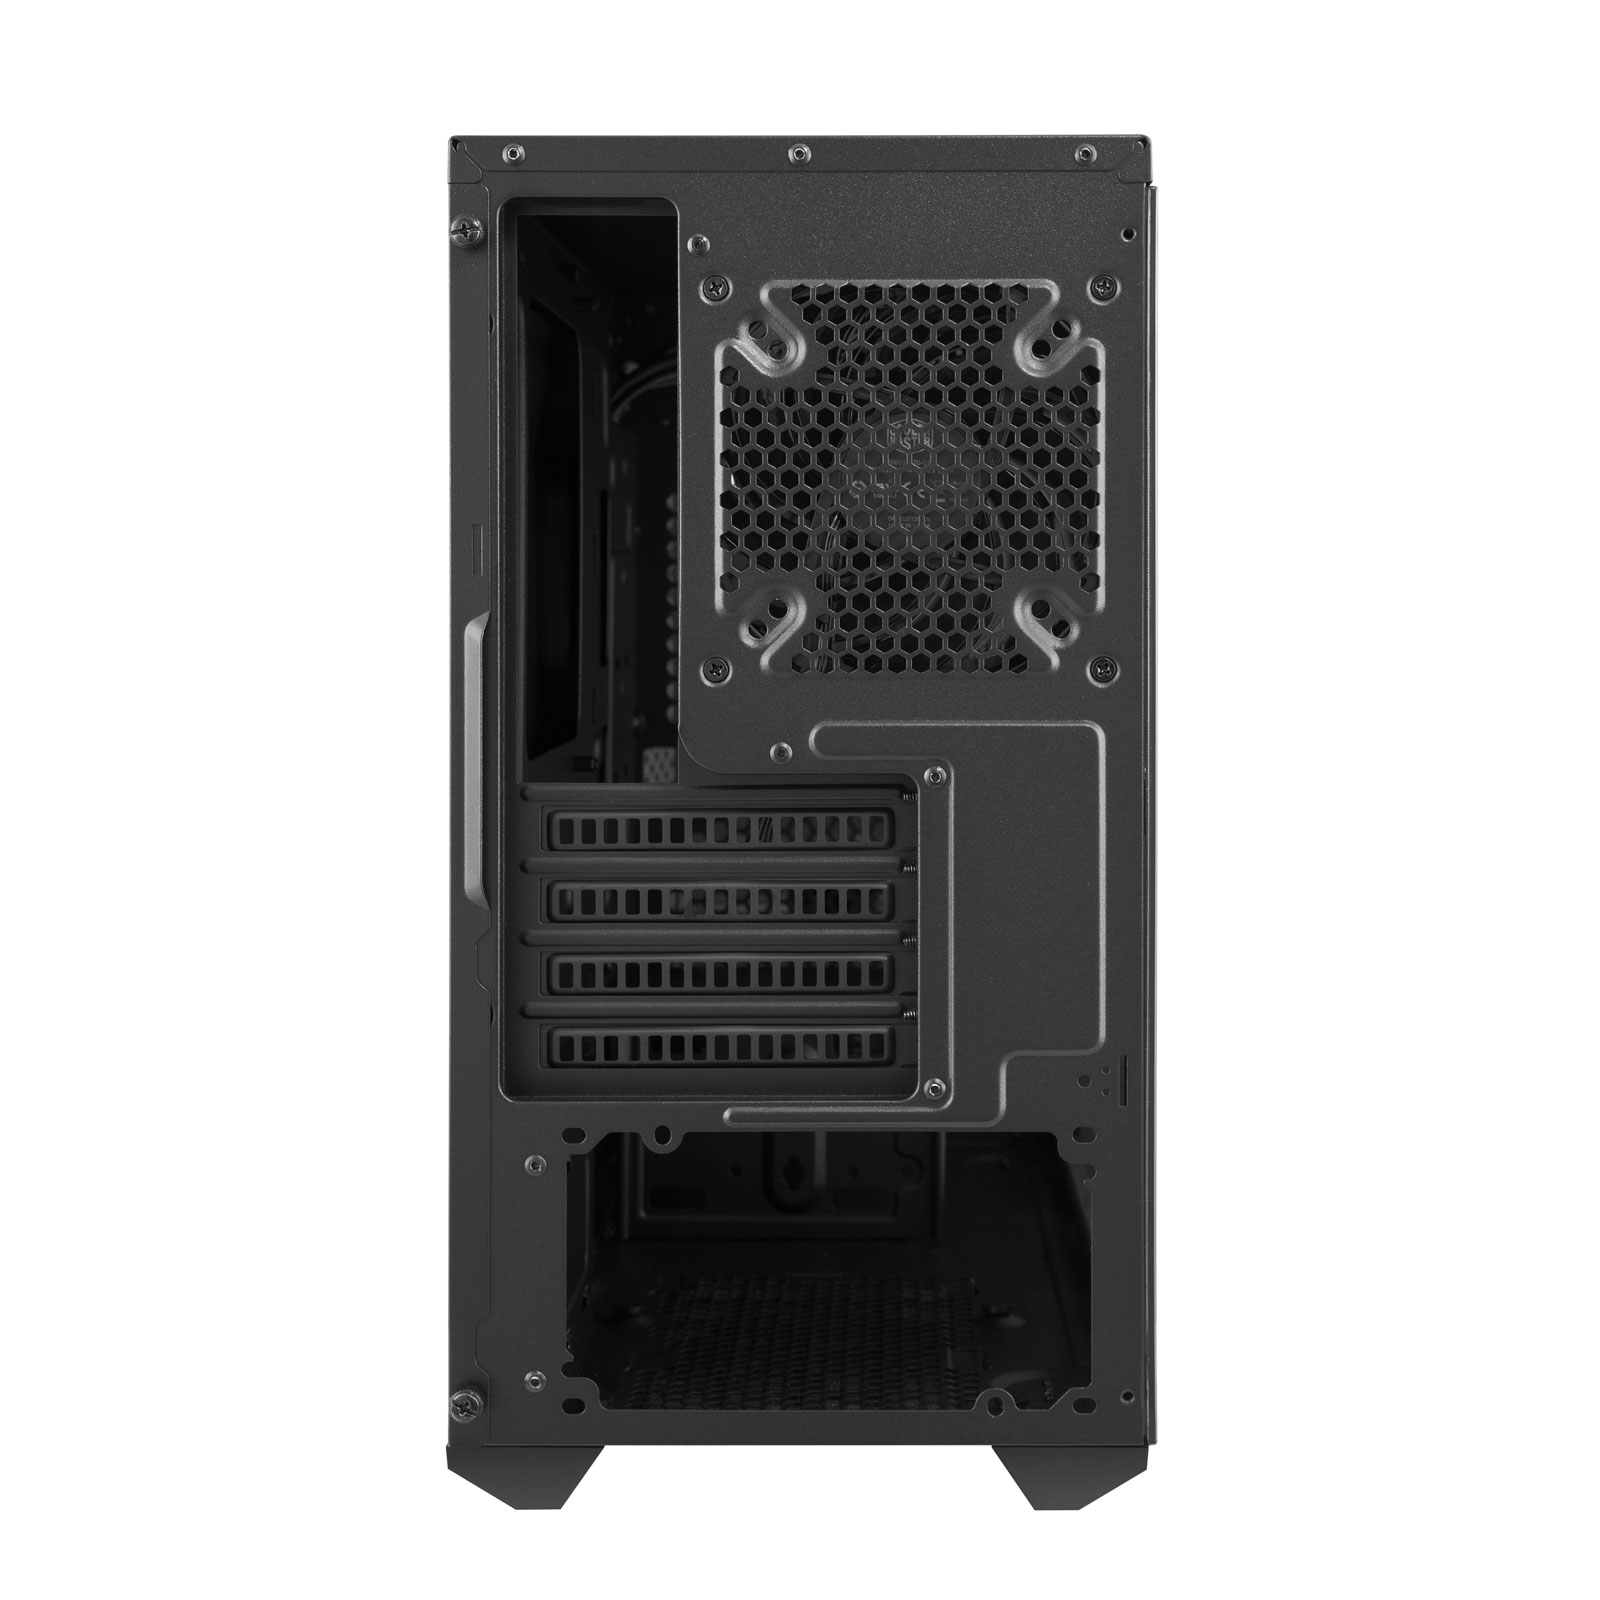 Cooler Master MasterBox Lite 3.1 TG MCW-L3S3-KGNN-00 -mT/Ss Alim Noir - Boîtier PC - 2